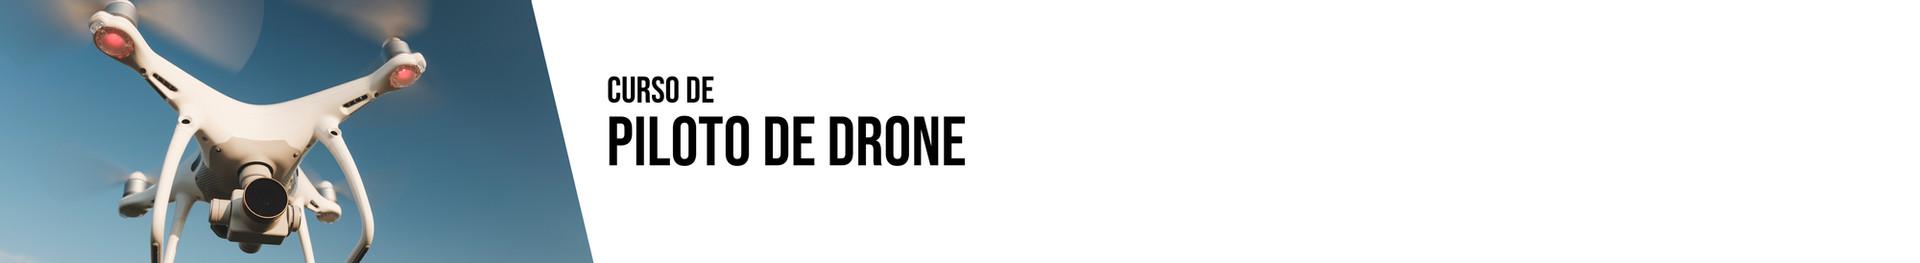 treinamento de piloto de drone - capa.jp